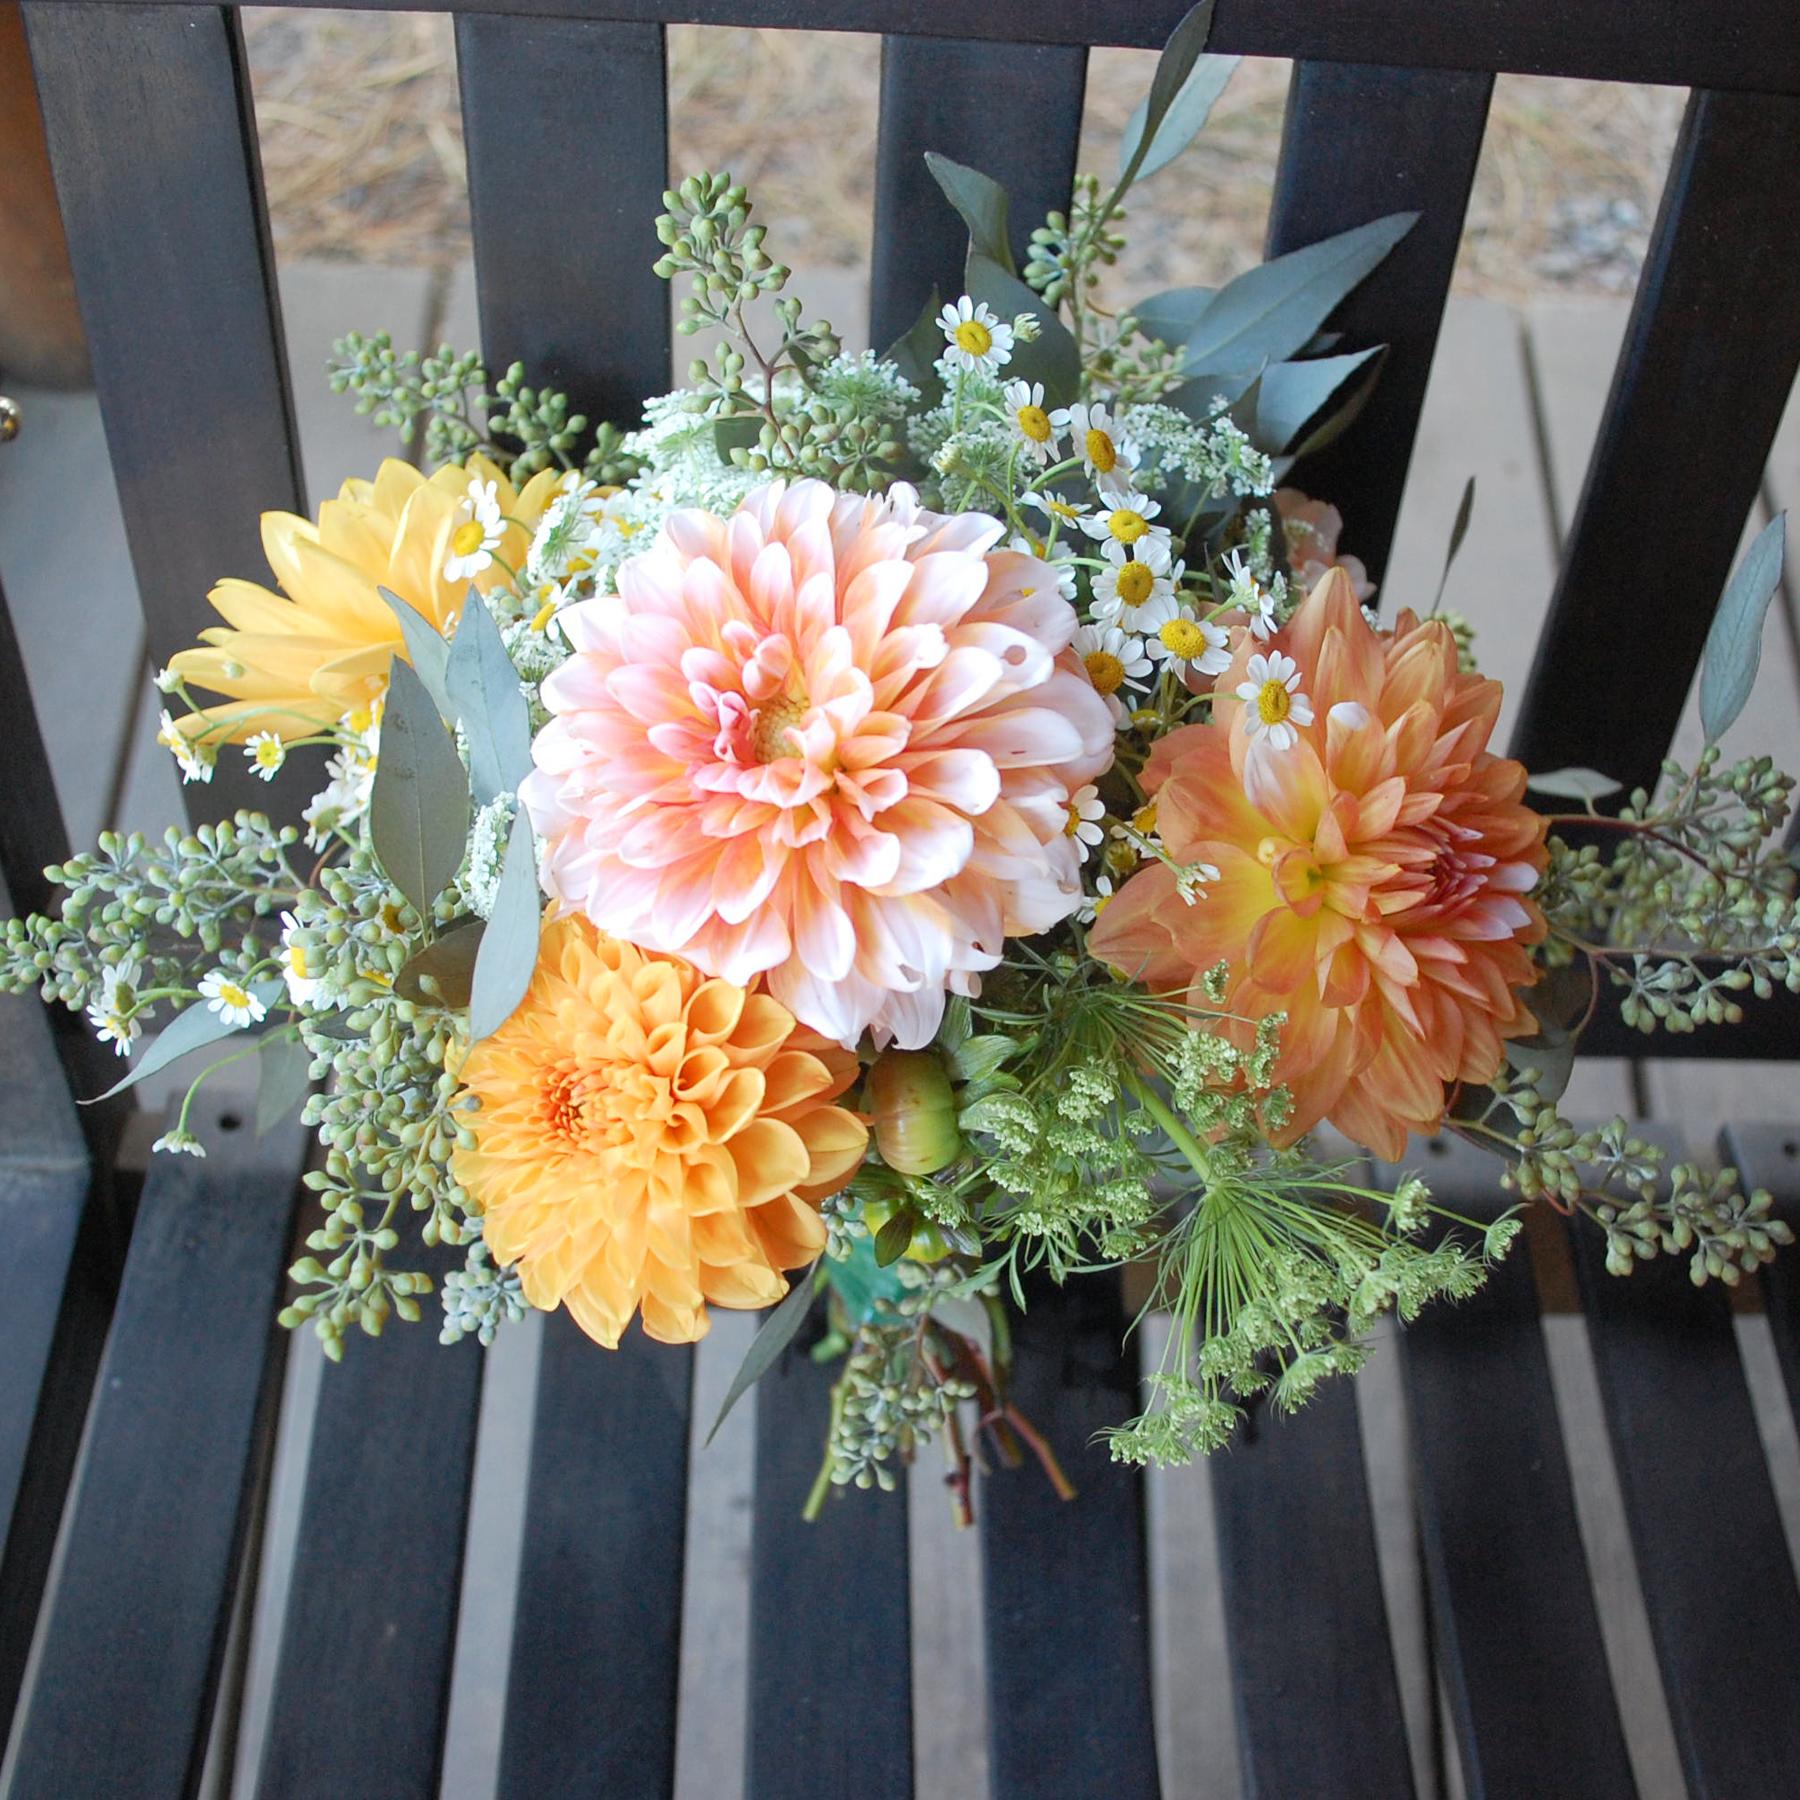 Rustic-bouquet-dahlias-orange-white.jpg